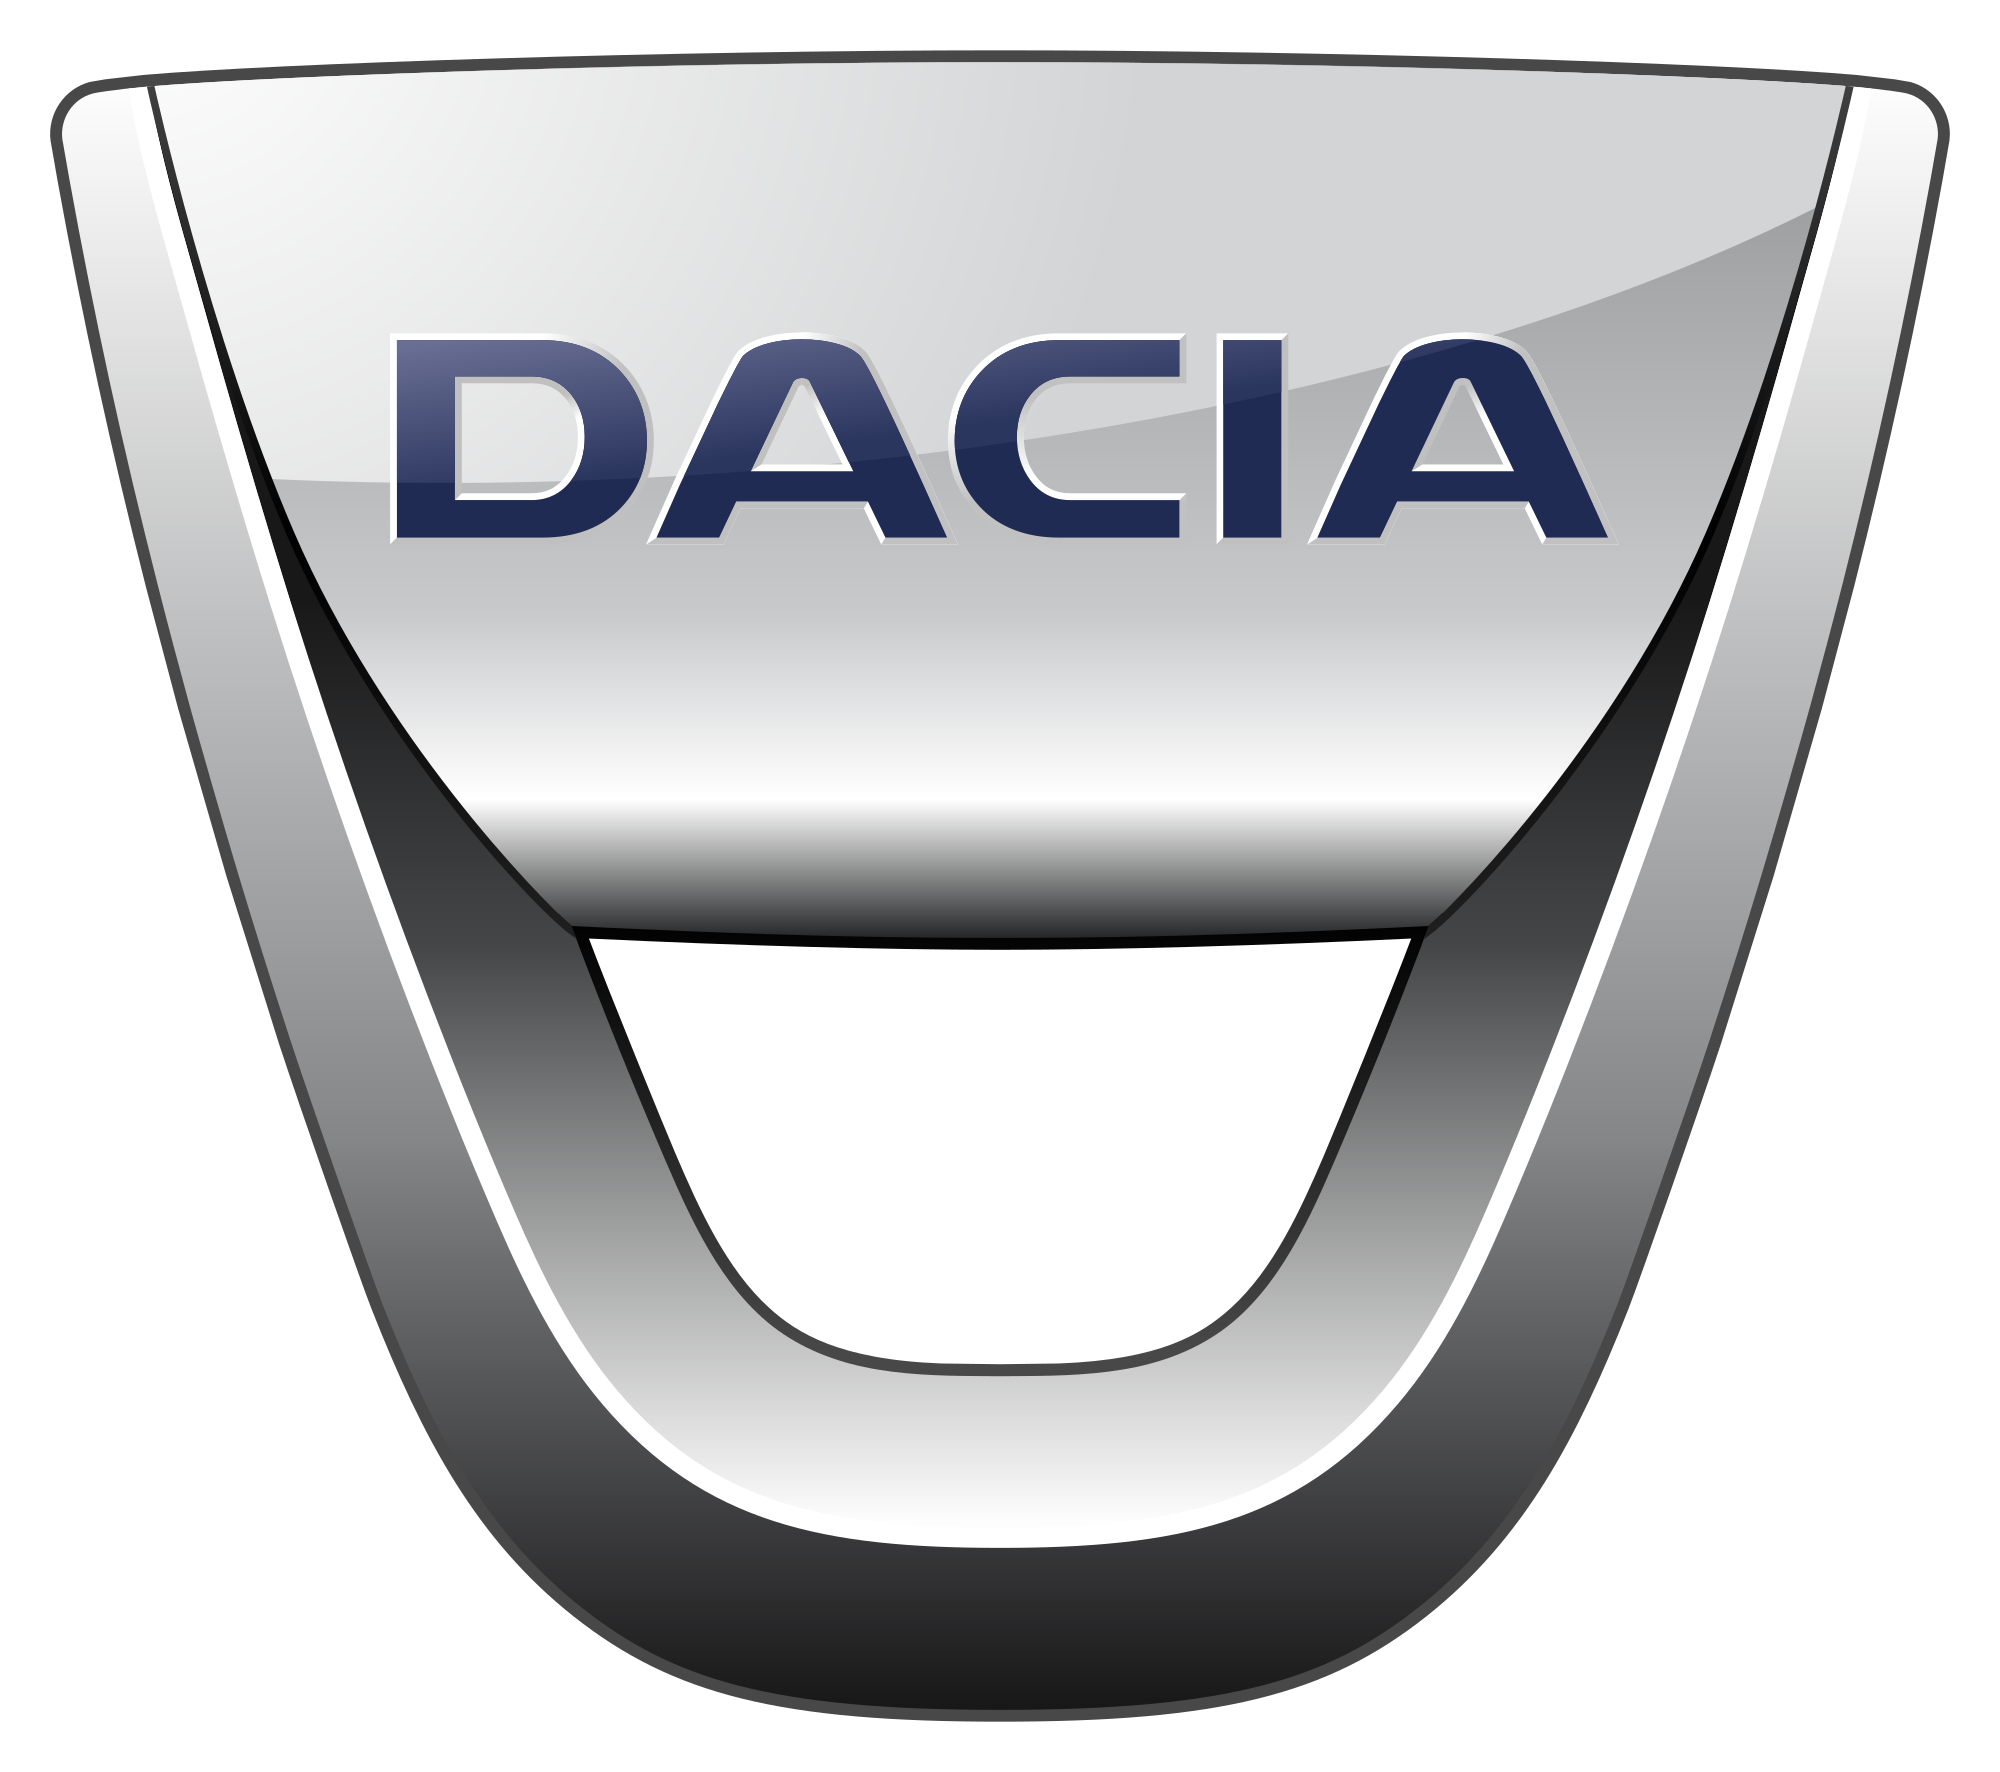 File:Dacia logo 2008.png